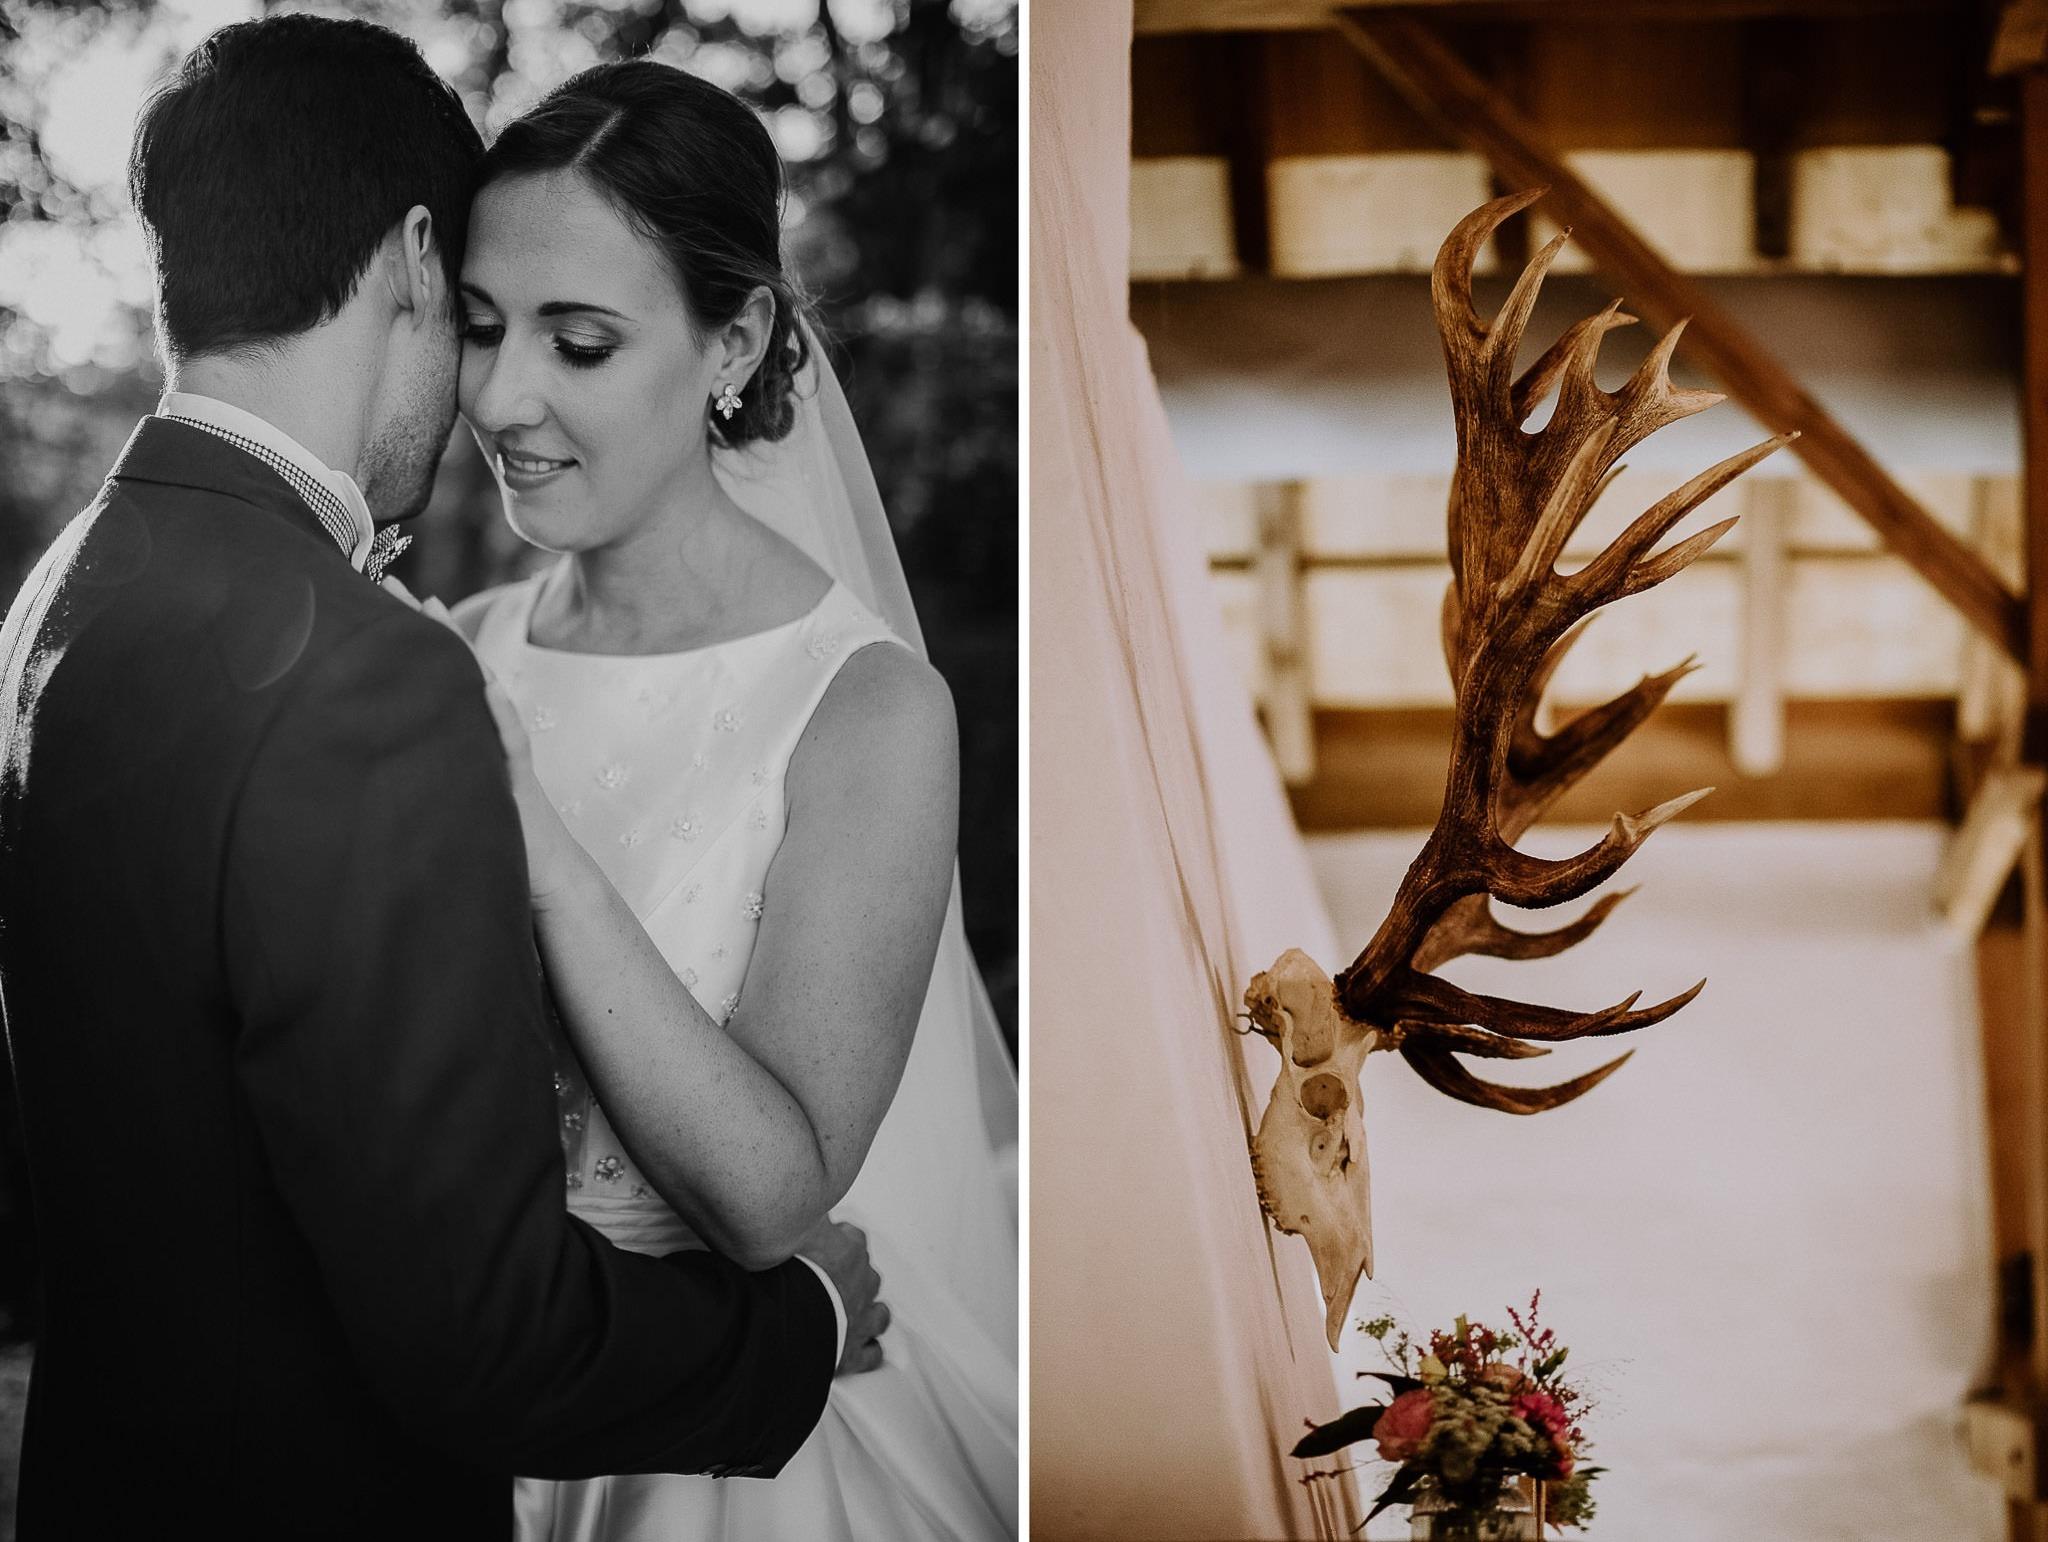 wedding photographer hamilton new zealand 1068 2